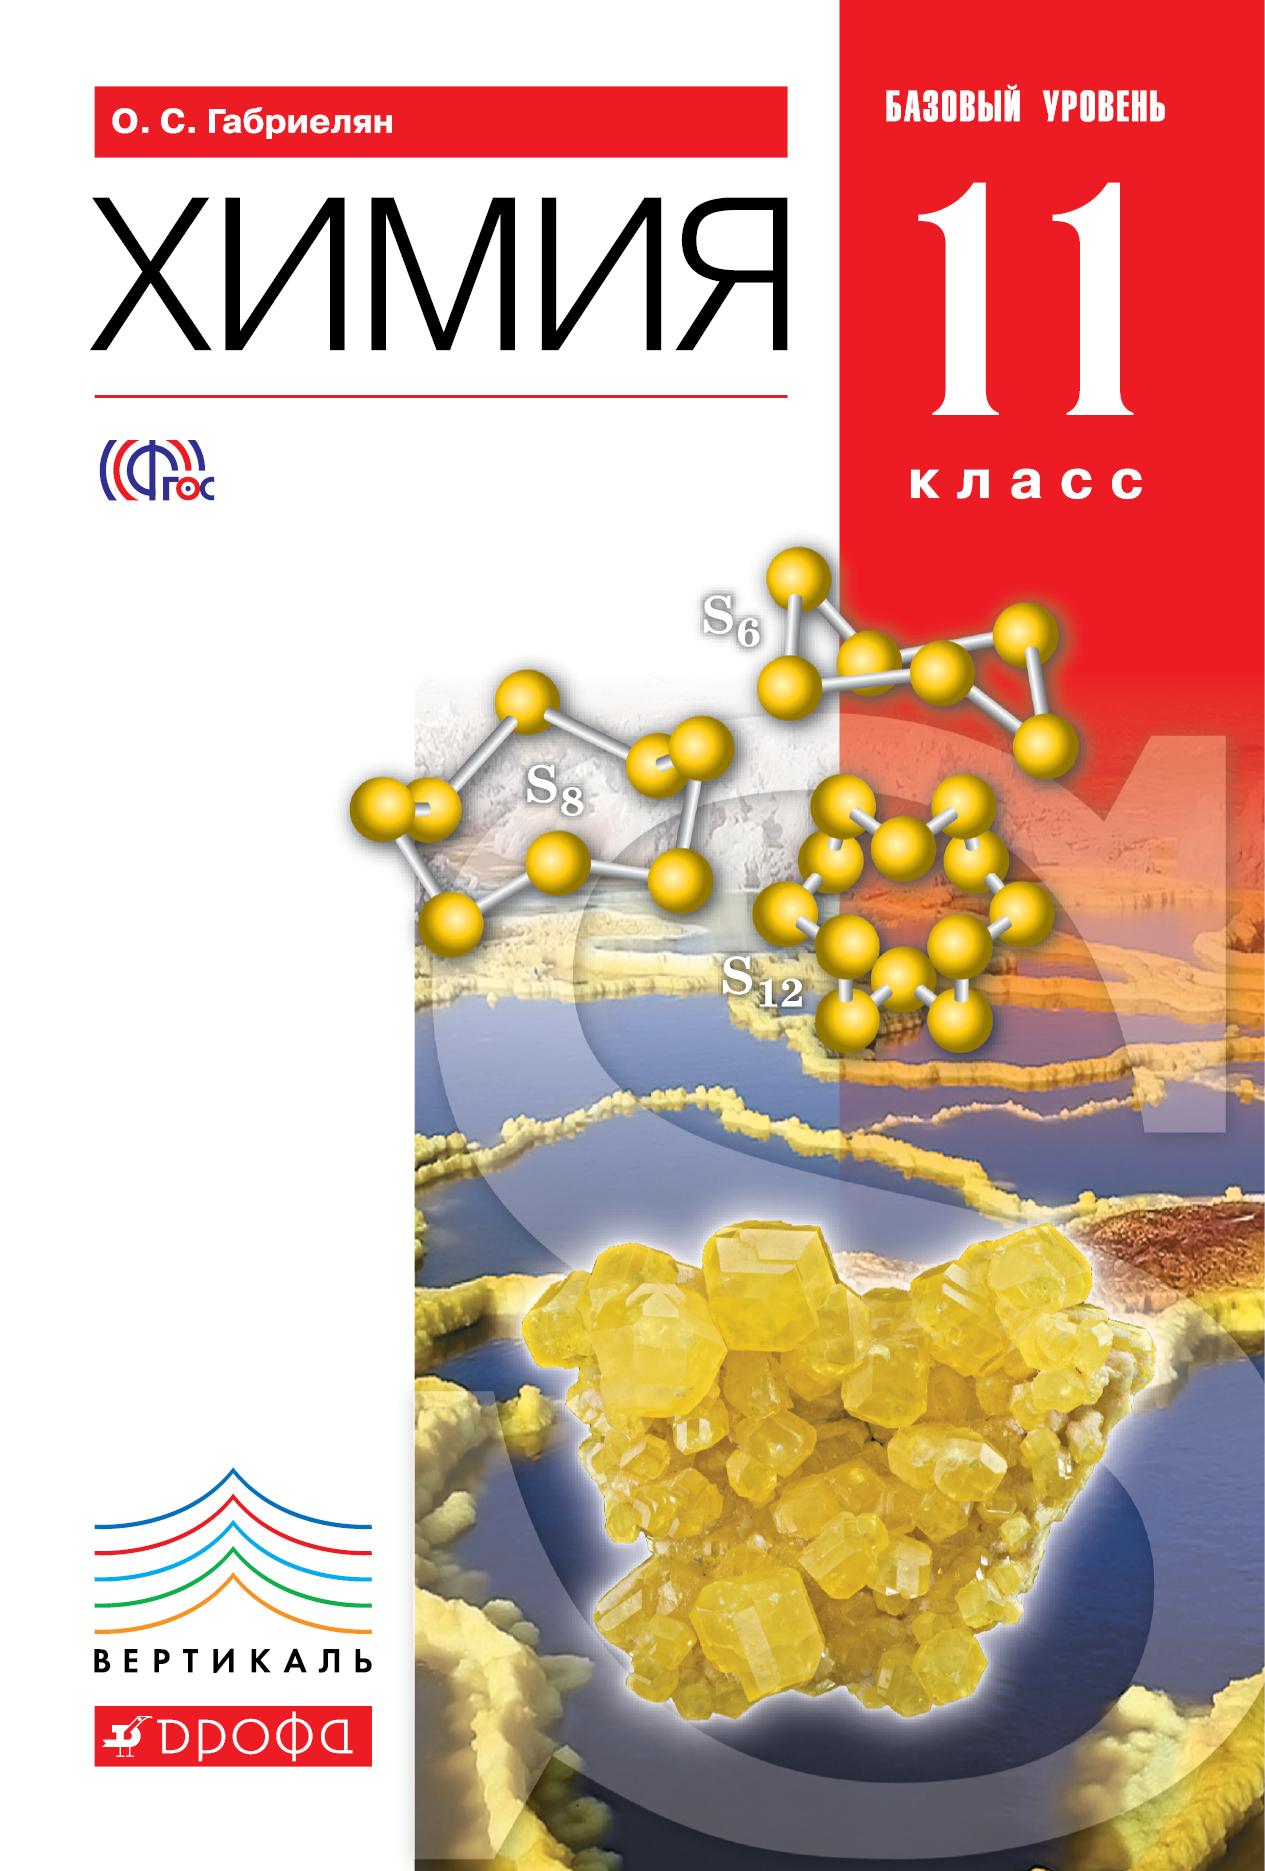 Химия 11кл [Учебник] баз. ур. ВЕРТИКАЛЬ ФП